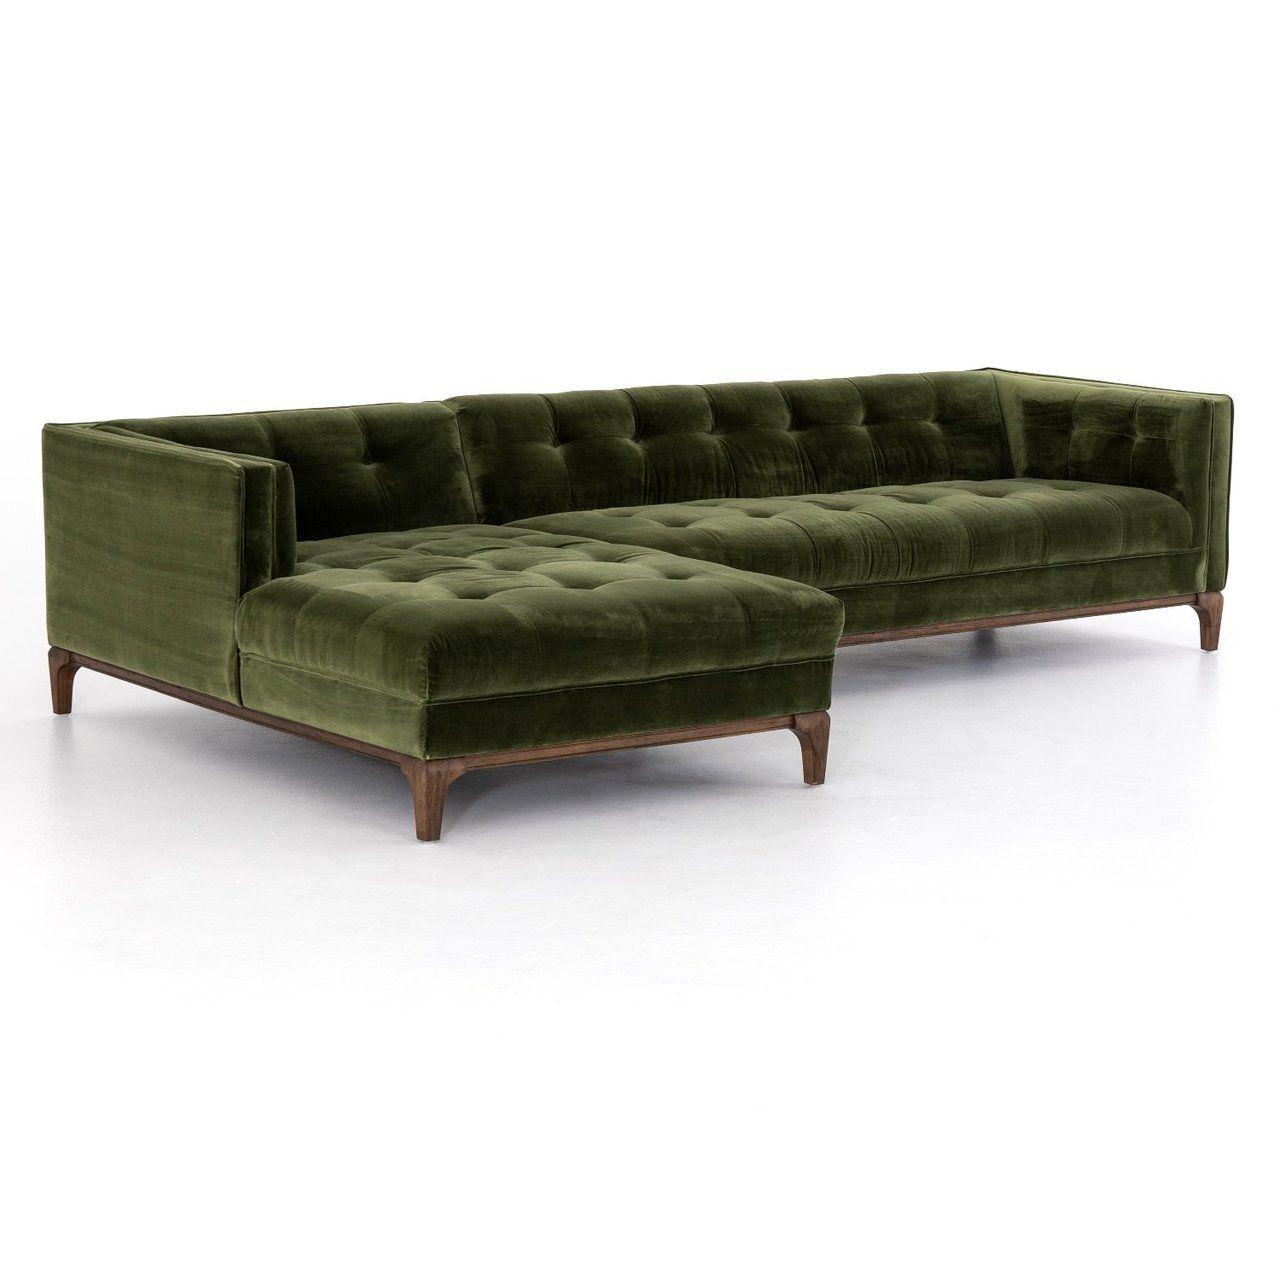 Florence Mid Century Modern Velvet Right Sectional Sofas Regarding Well Known Dylan Modern Olive Green Velvet Tufted Sectional Sofa (View 12 of 20)